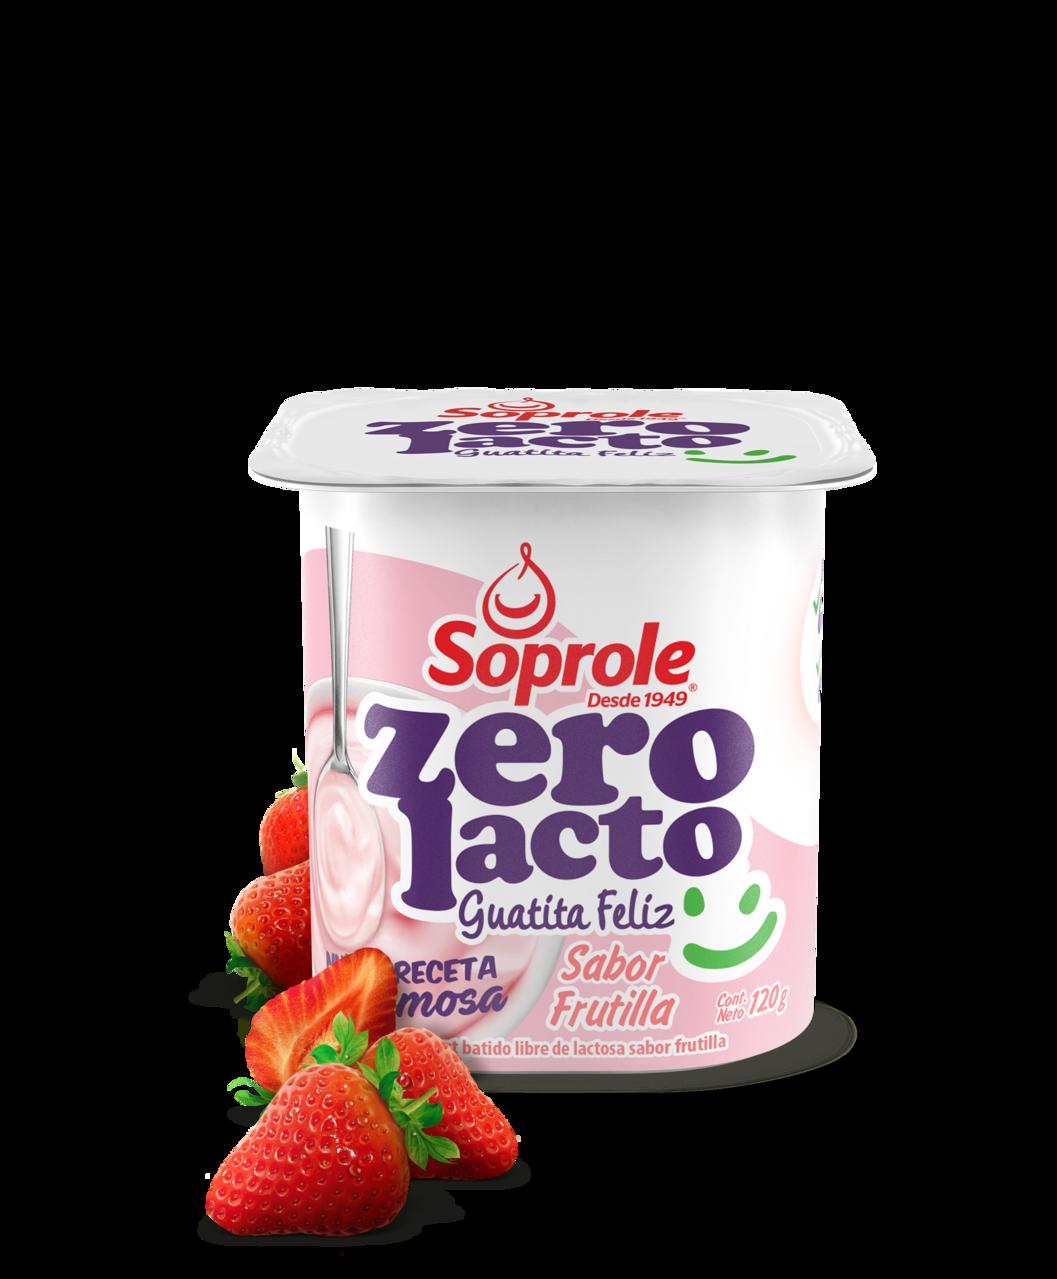 Soprole Zerolacto Yoghurt Batido sabor Frutilla